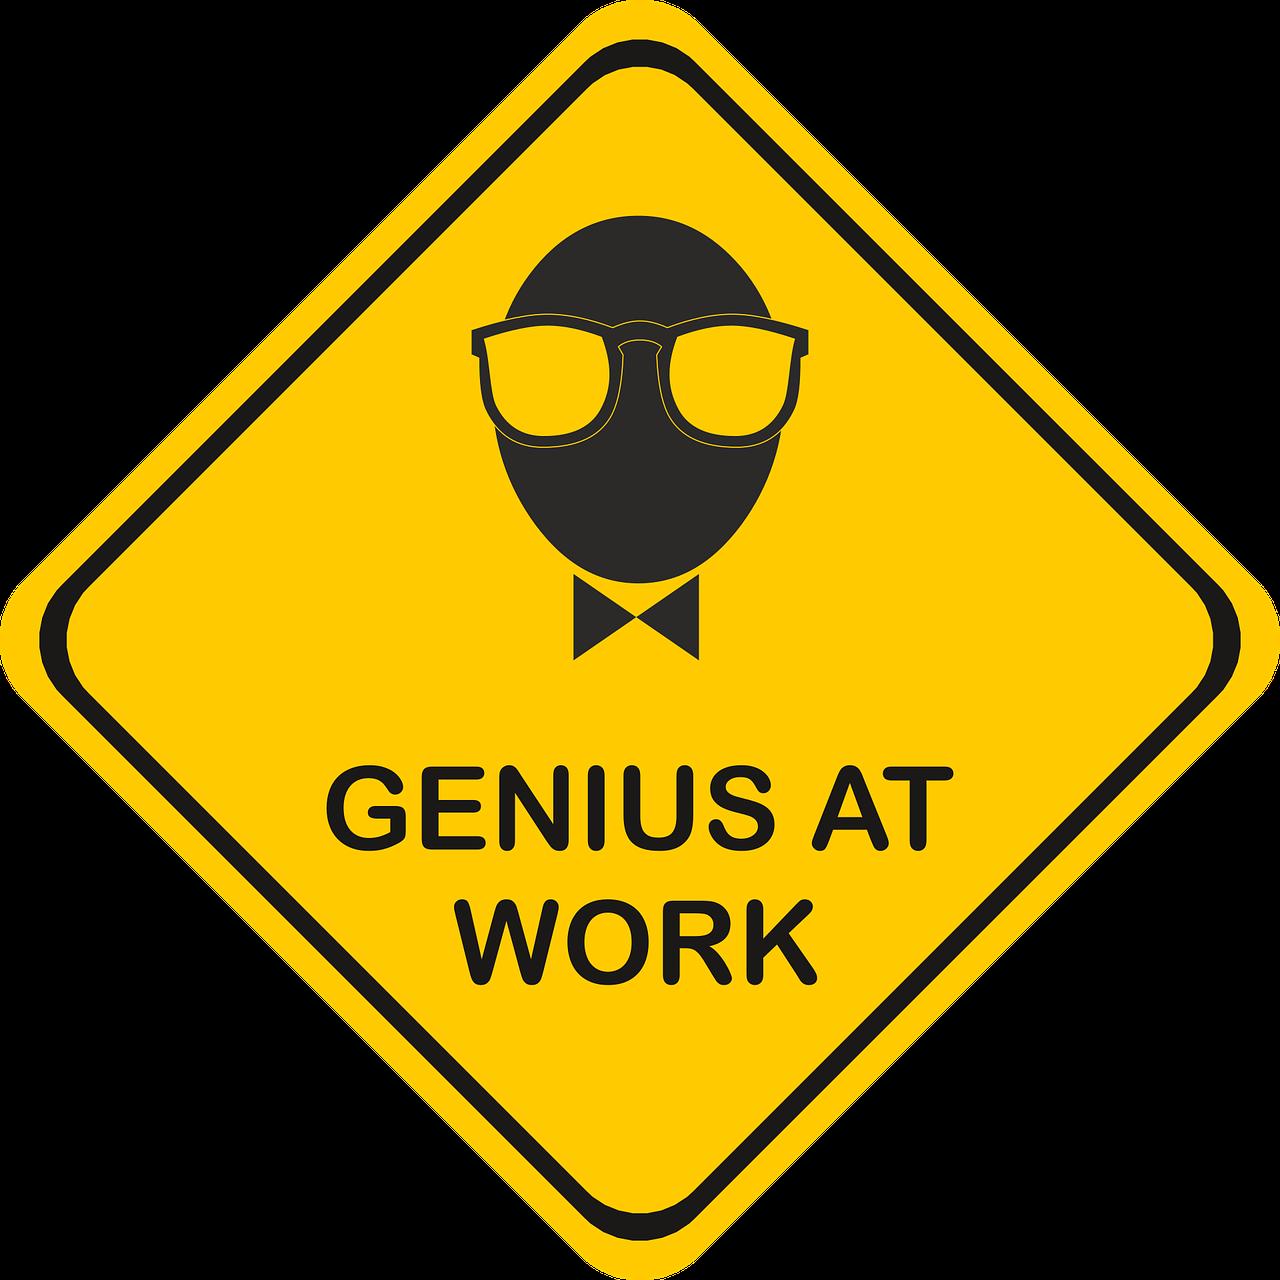 Genius Danger Sign